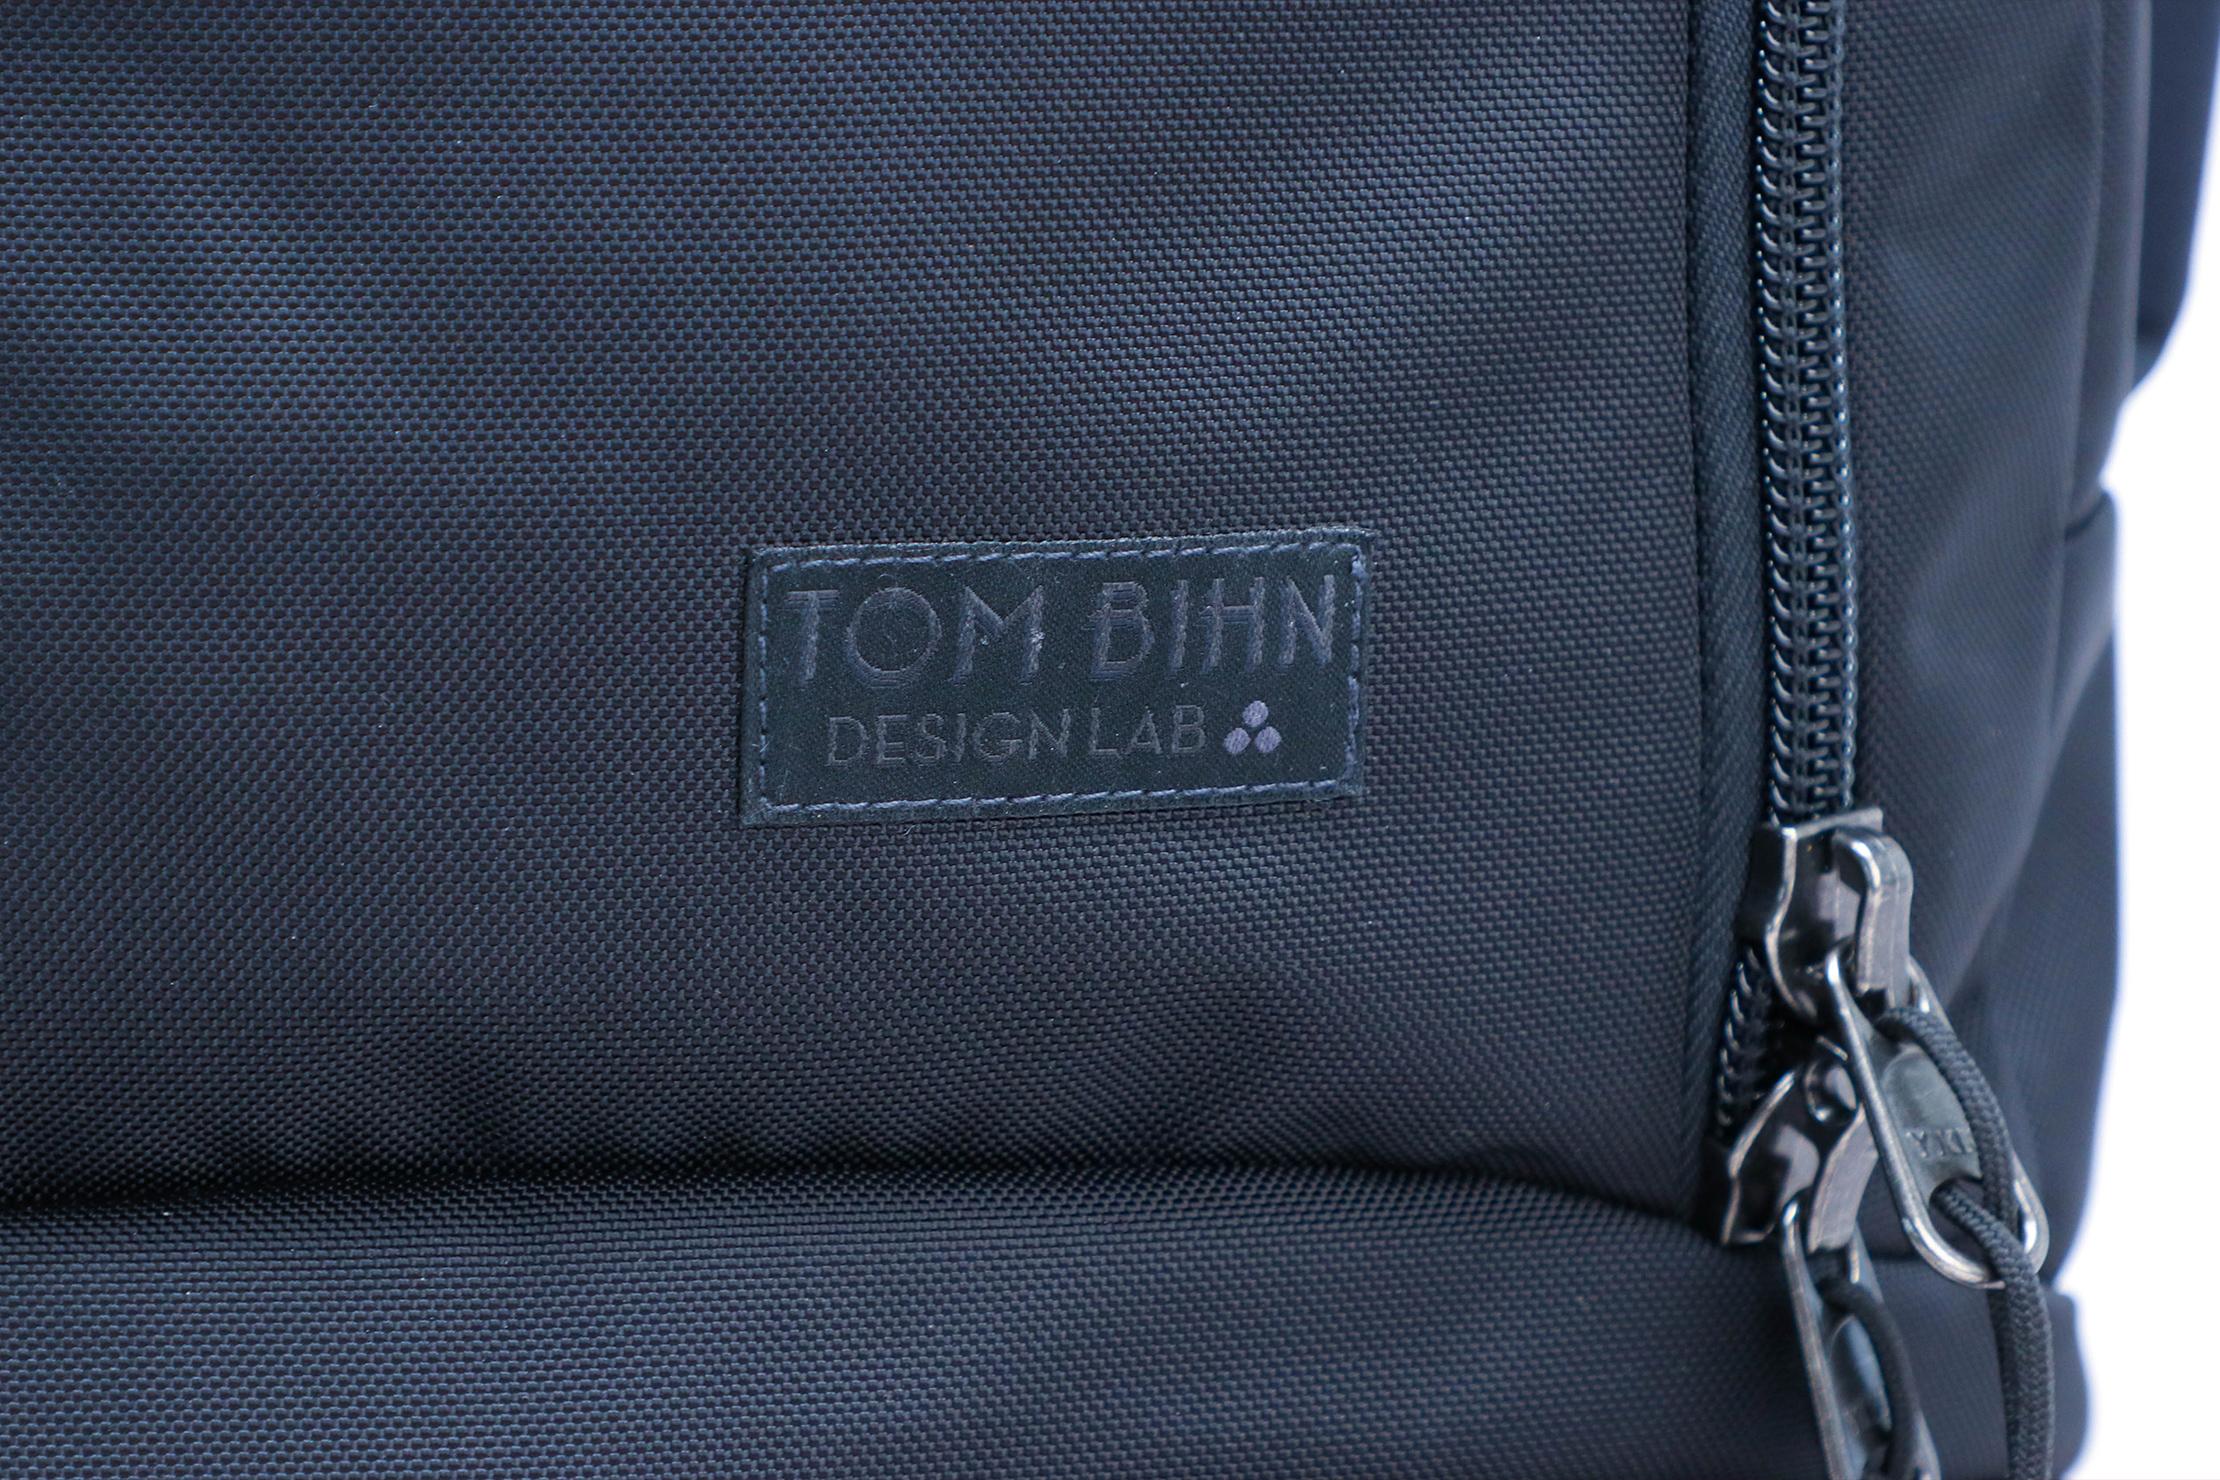 Tom Bihn Techonaut 30 Logo